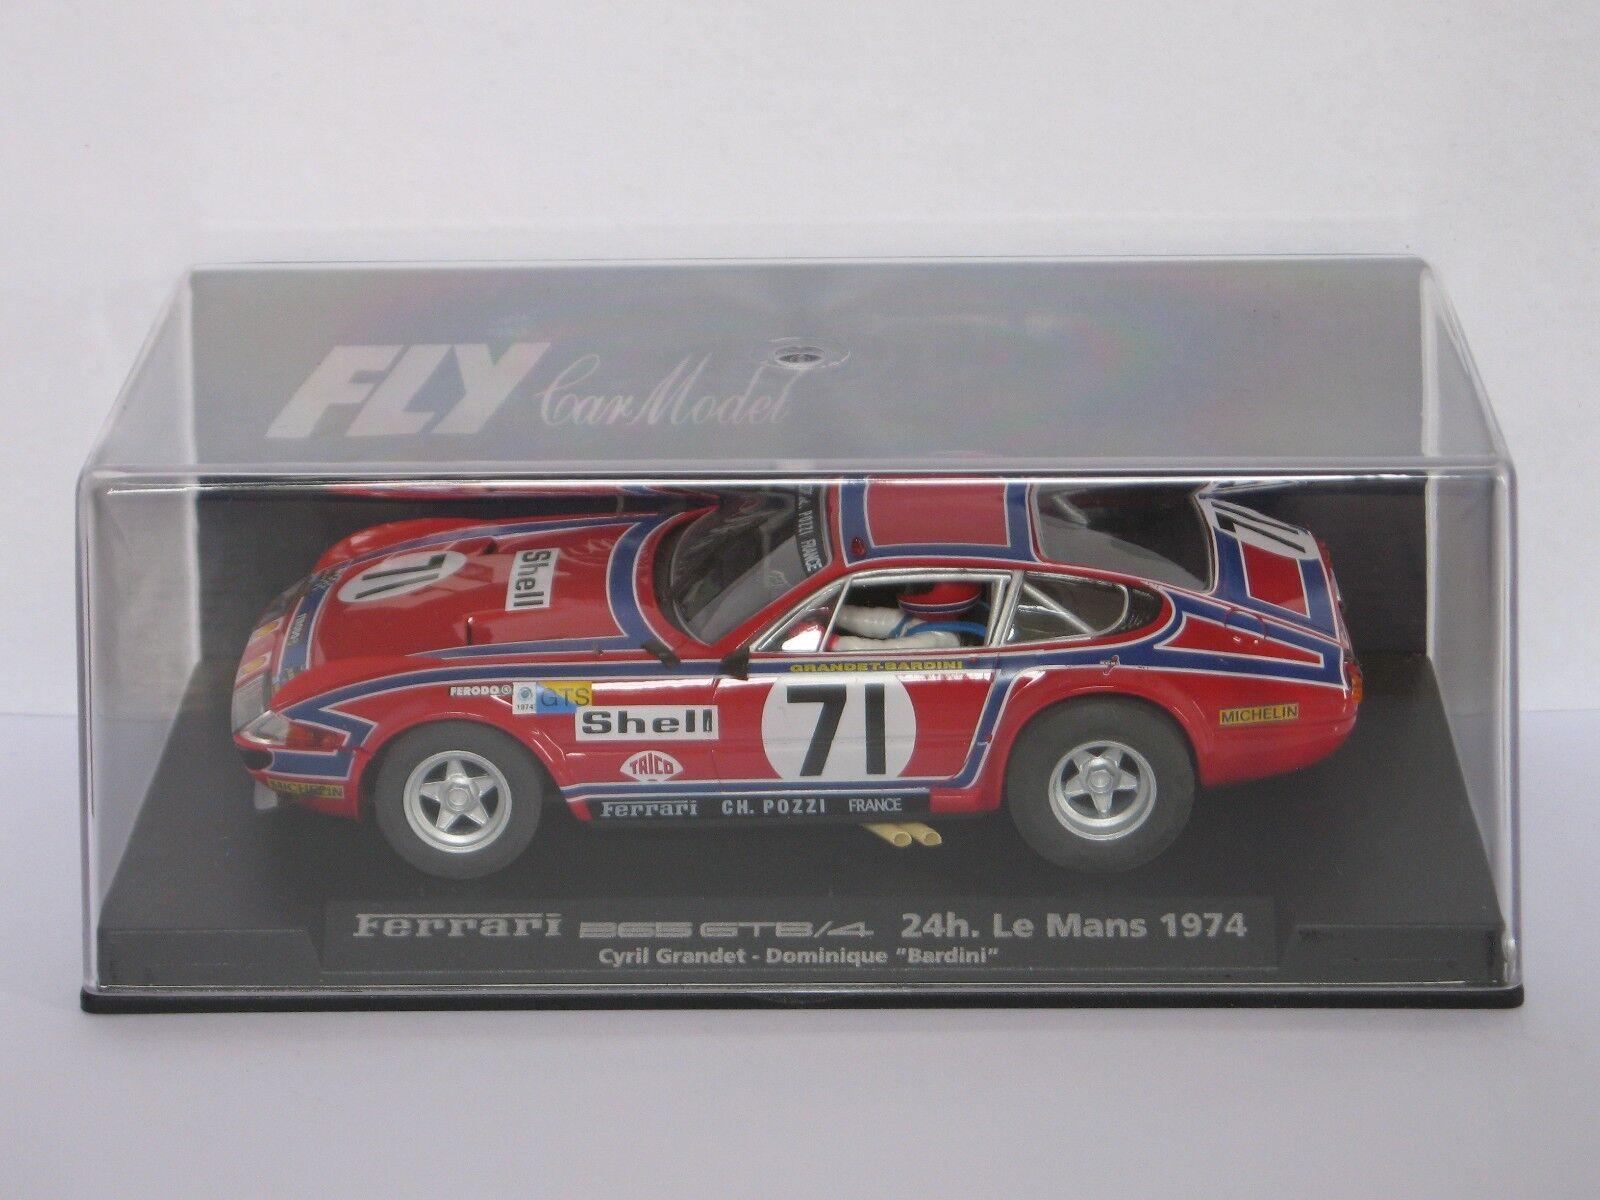 Fly Coche Ferrari 365 GTB 4 24h. le Mans 1974  71 - refs. A651 y 88077